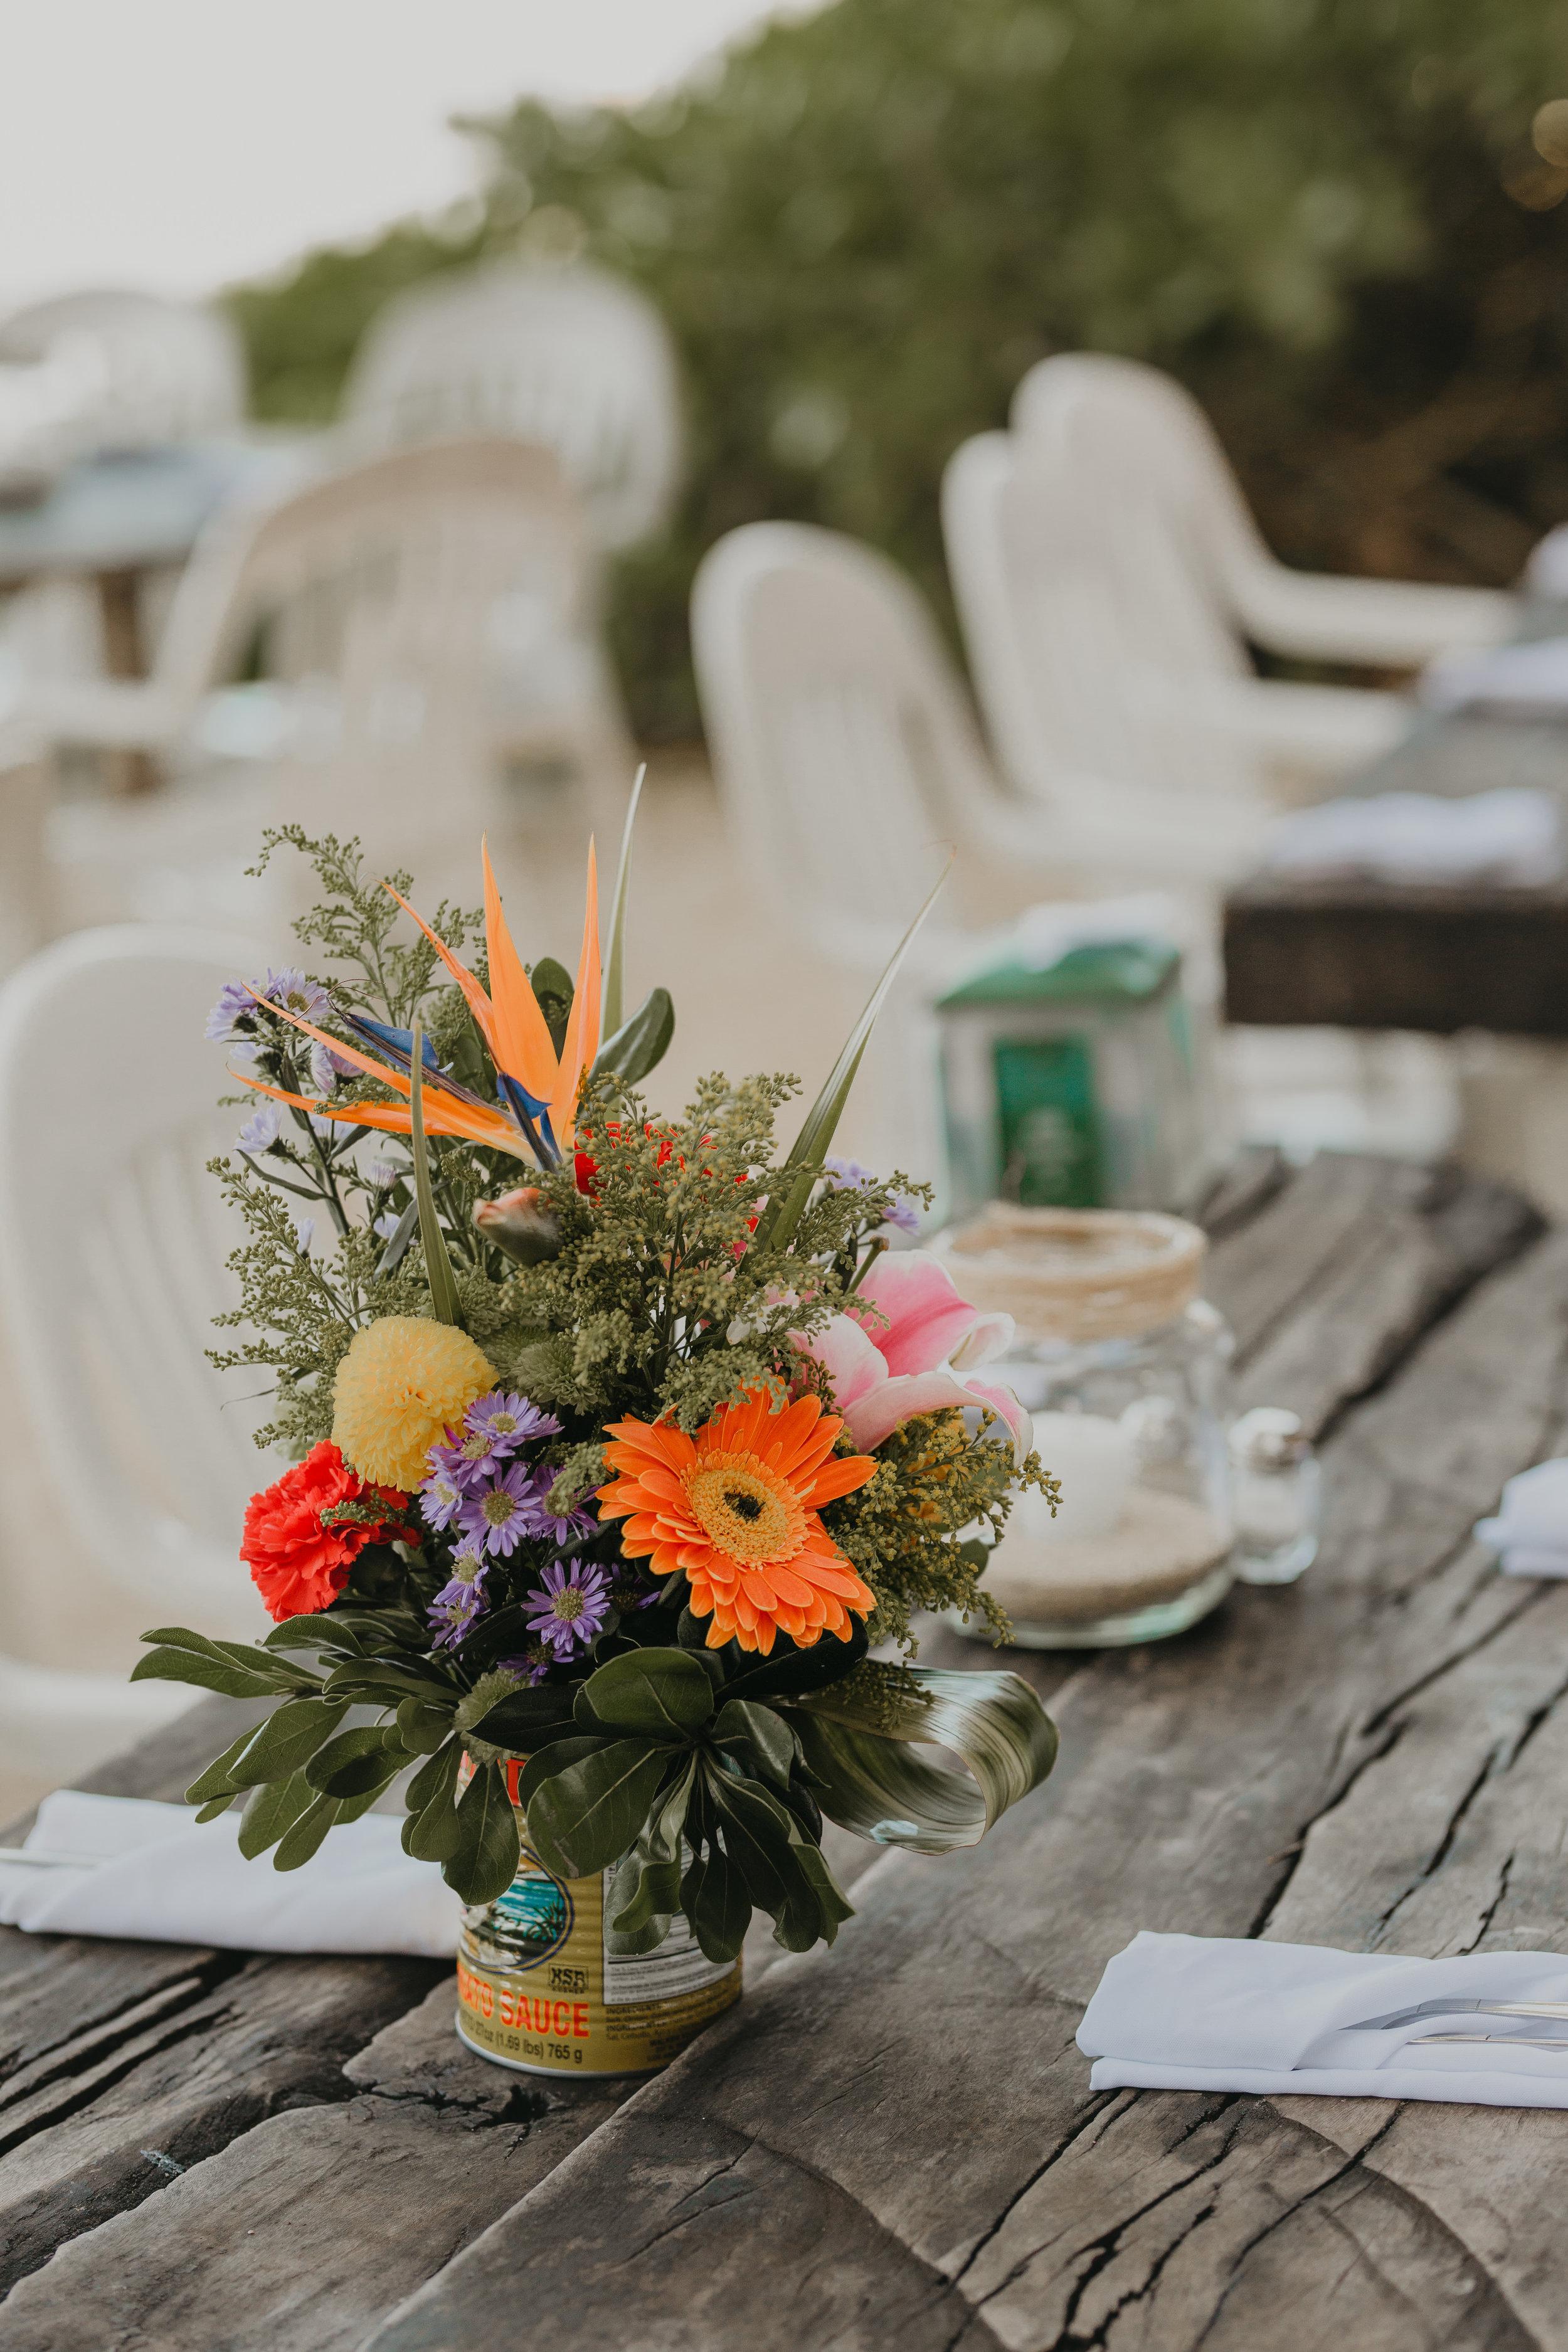 Nicole-Daacke-Photography-beachfront-akumal-destionation-wedding-tulum-mexico-elopement-photographer-destination-wedding-inspiration-sunset-champagne-pop-boho-bride-ocean-tropical-bohemian-tulum-wedding-photos-145.jpg